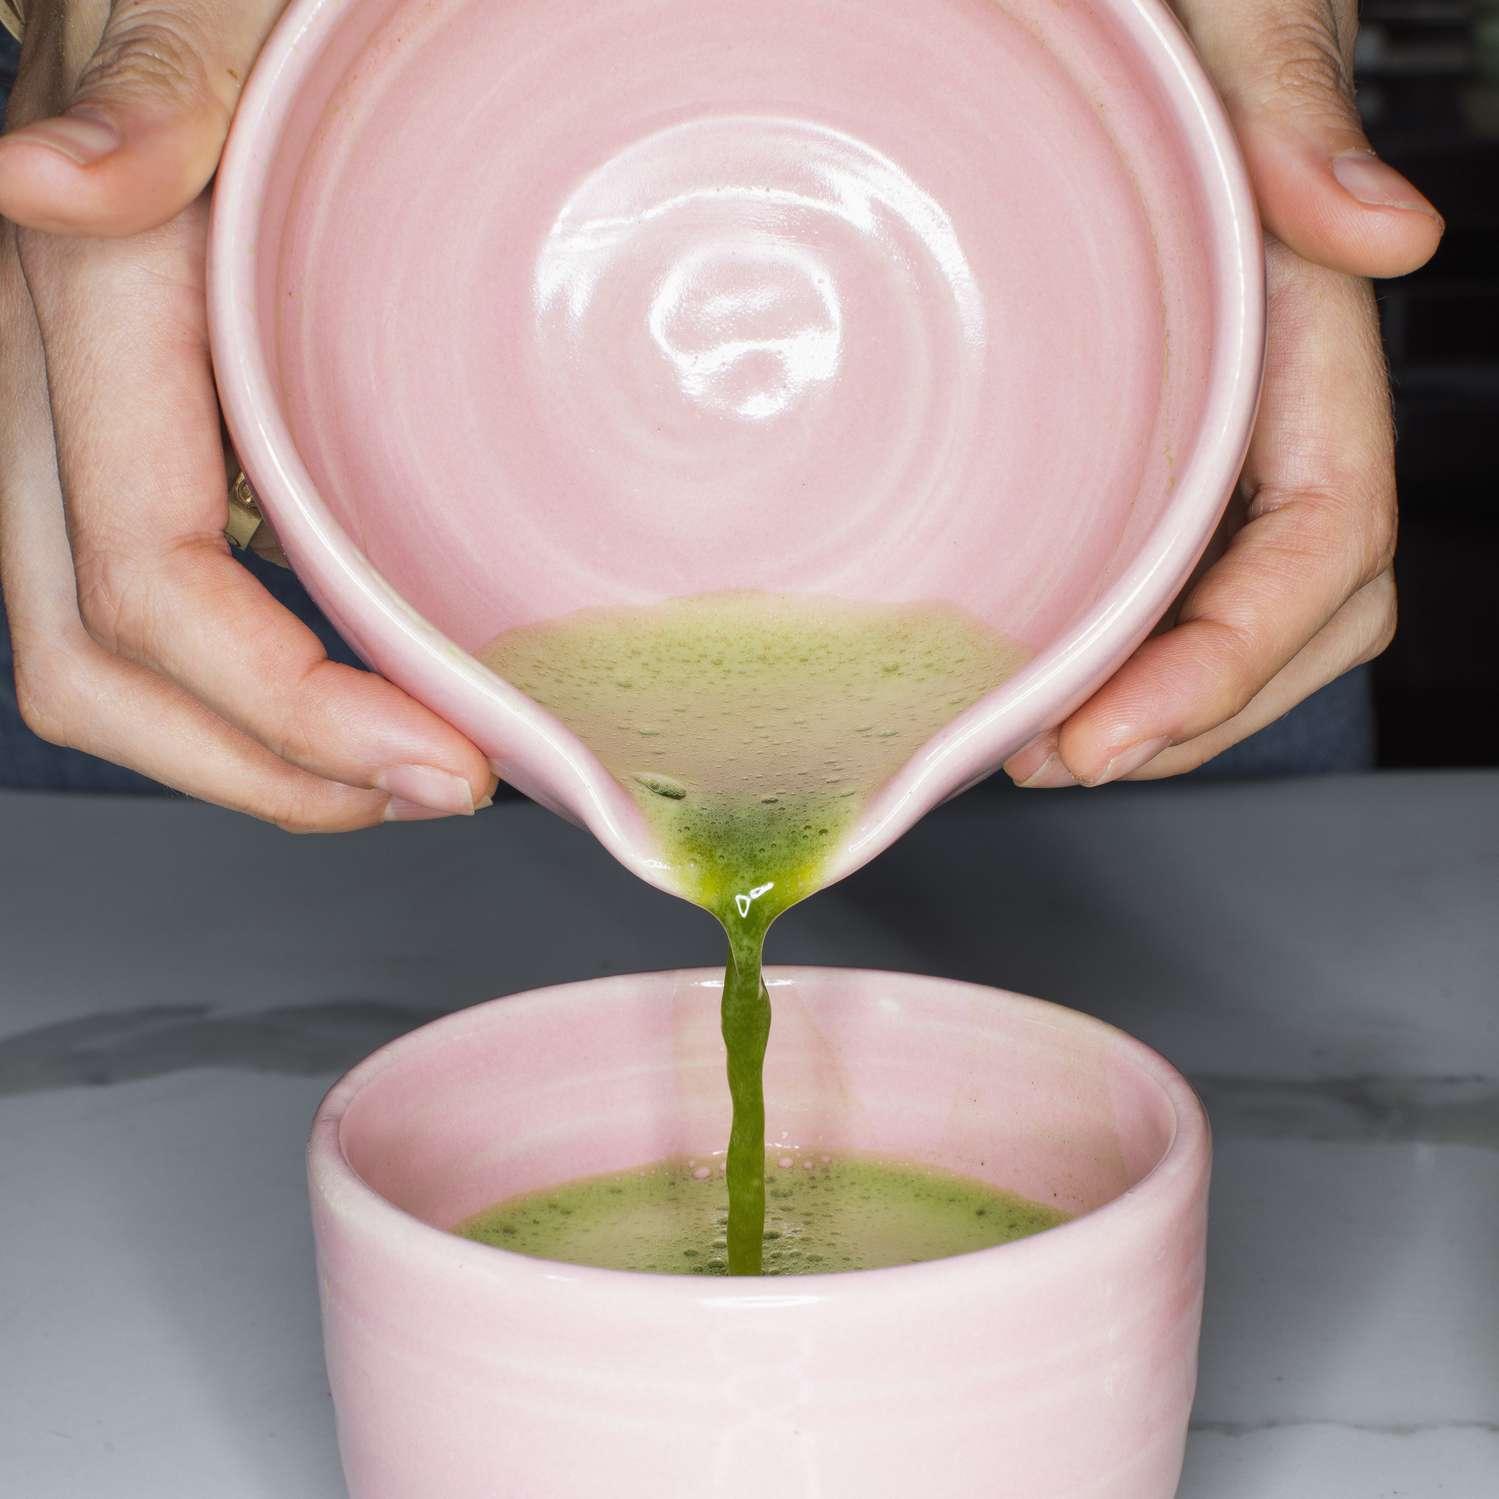 hands pouring green tea into a pink mug